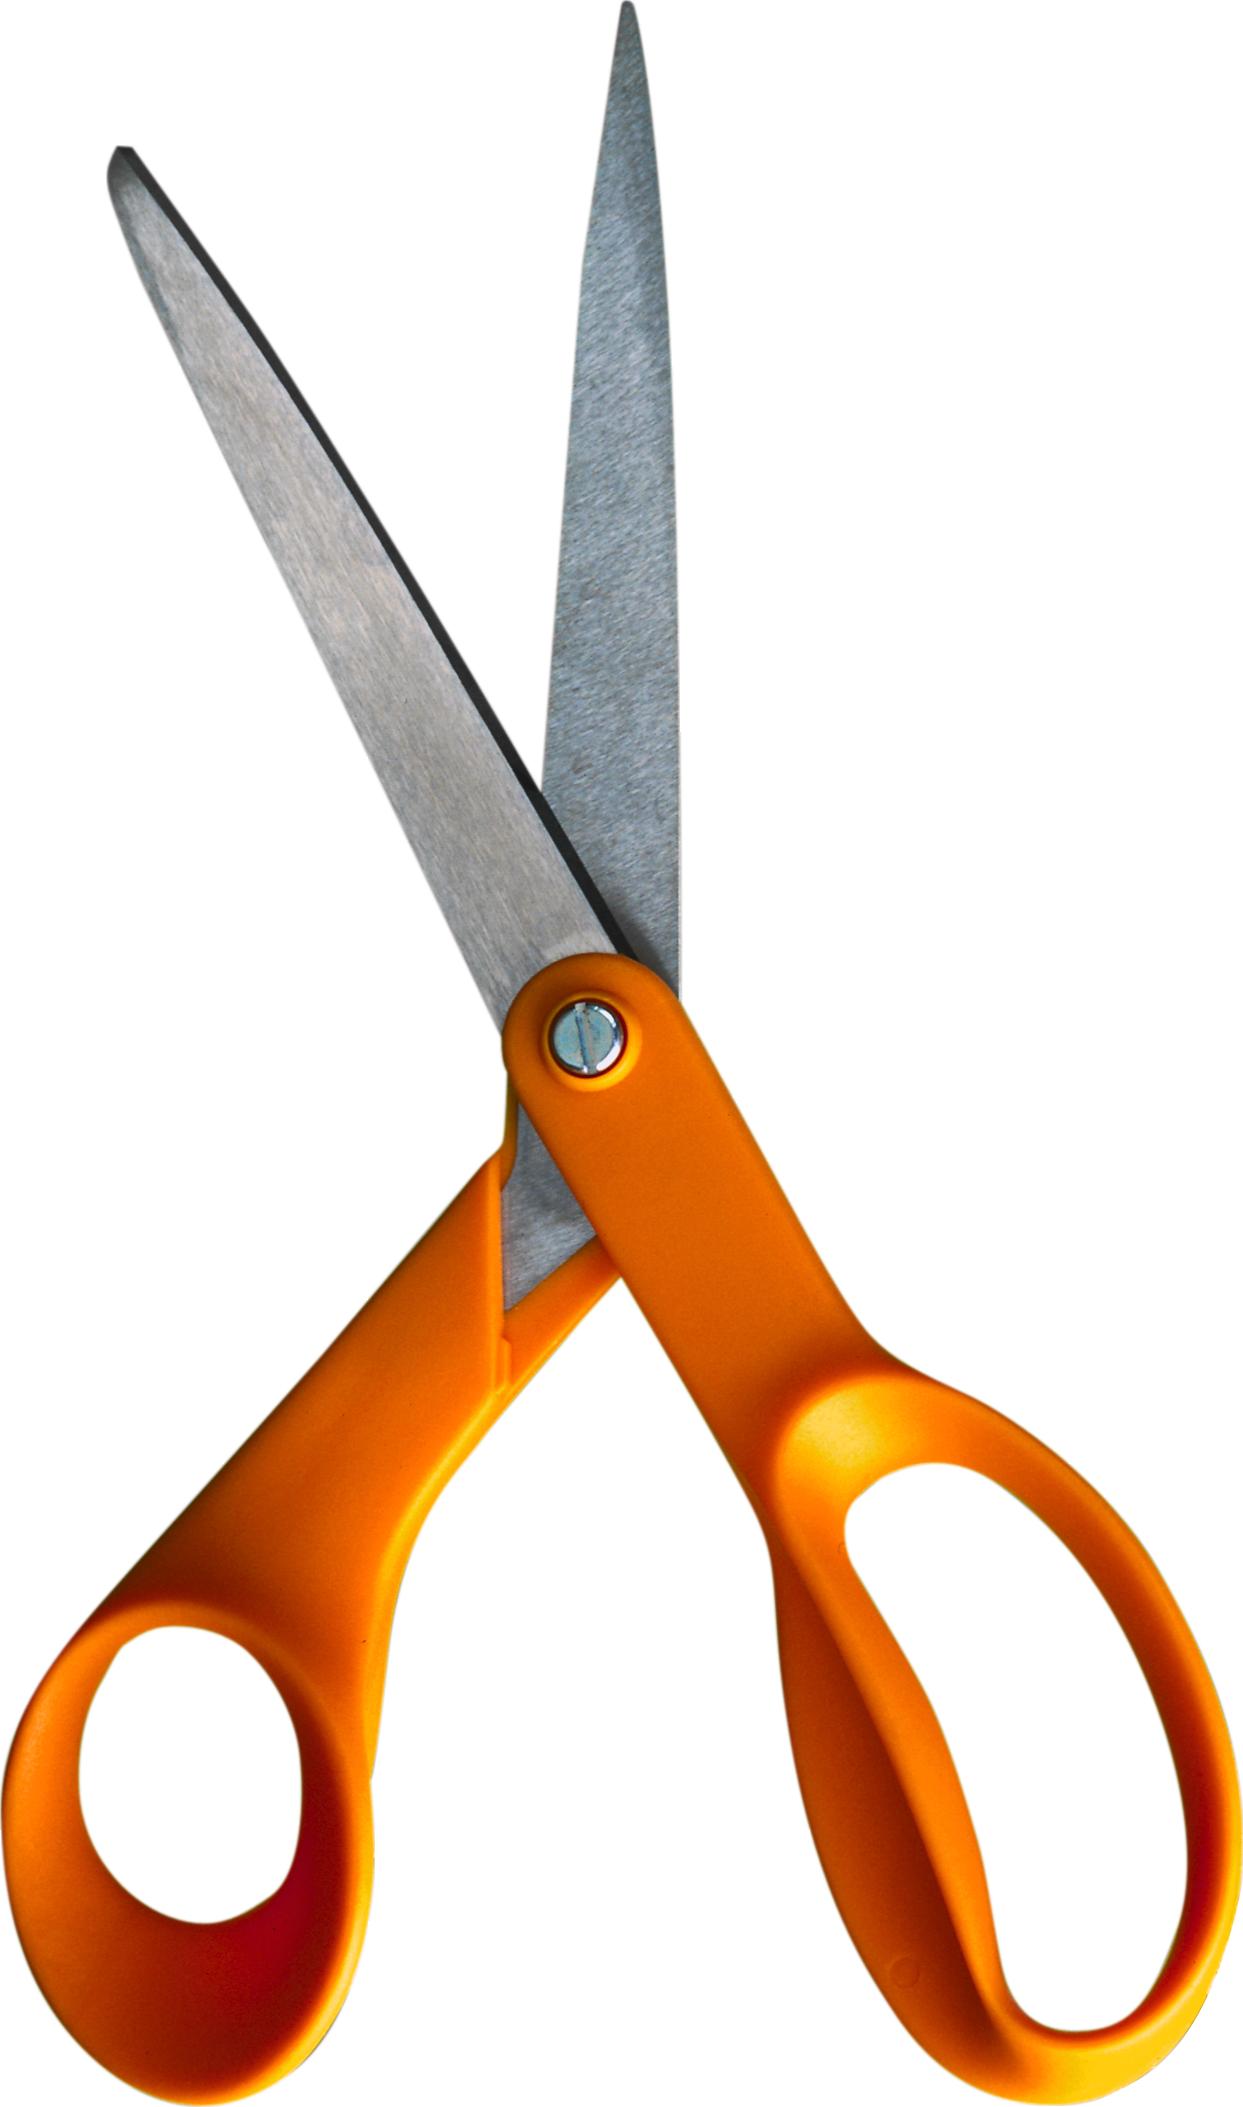 Shears clipart sizer. Scissors png images orange